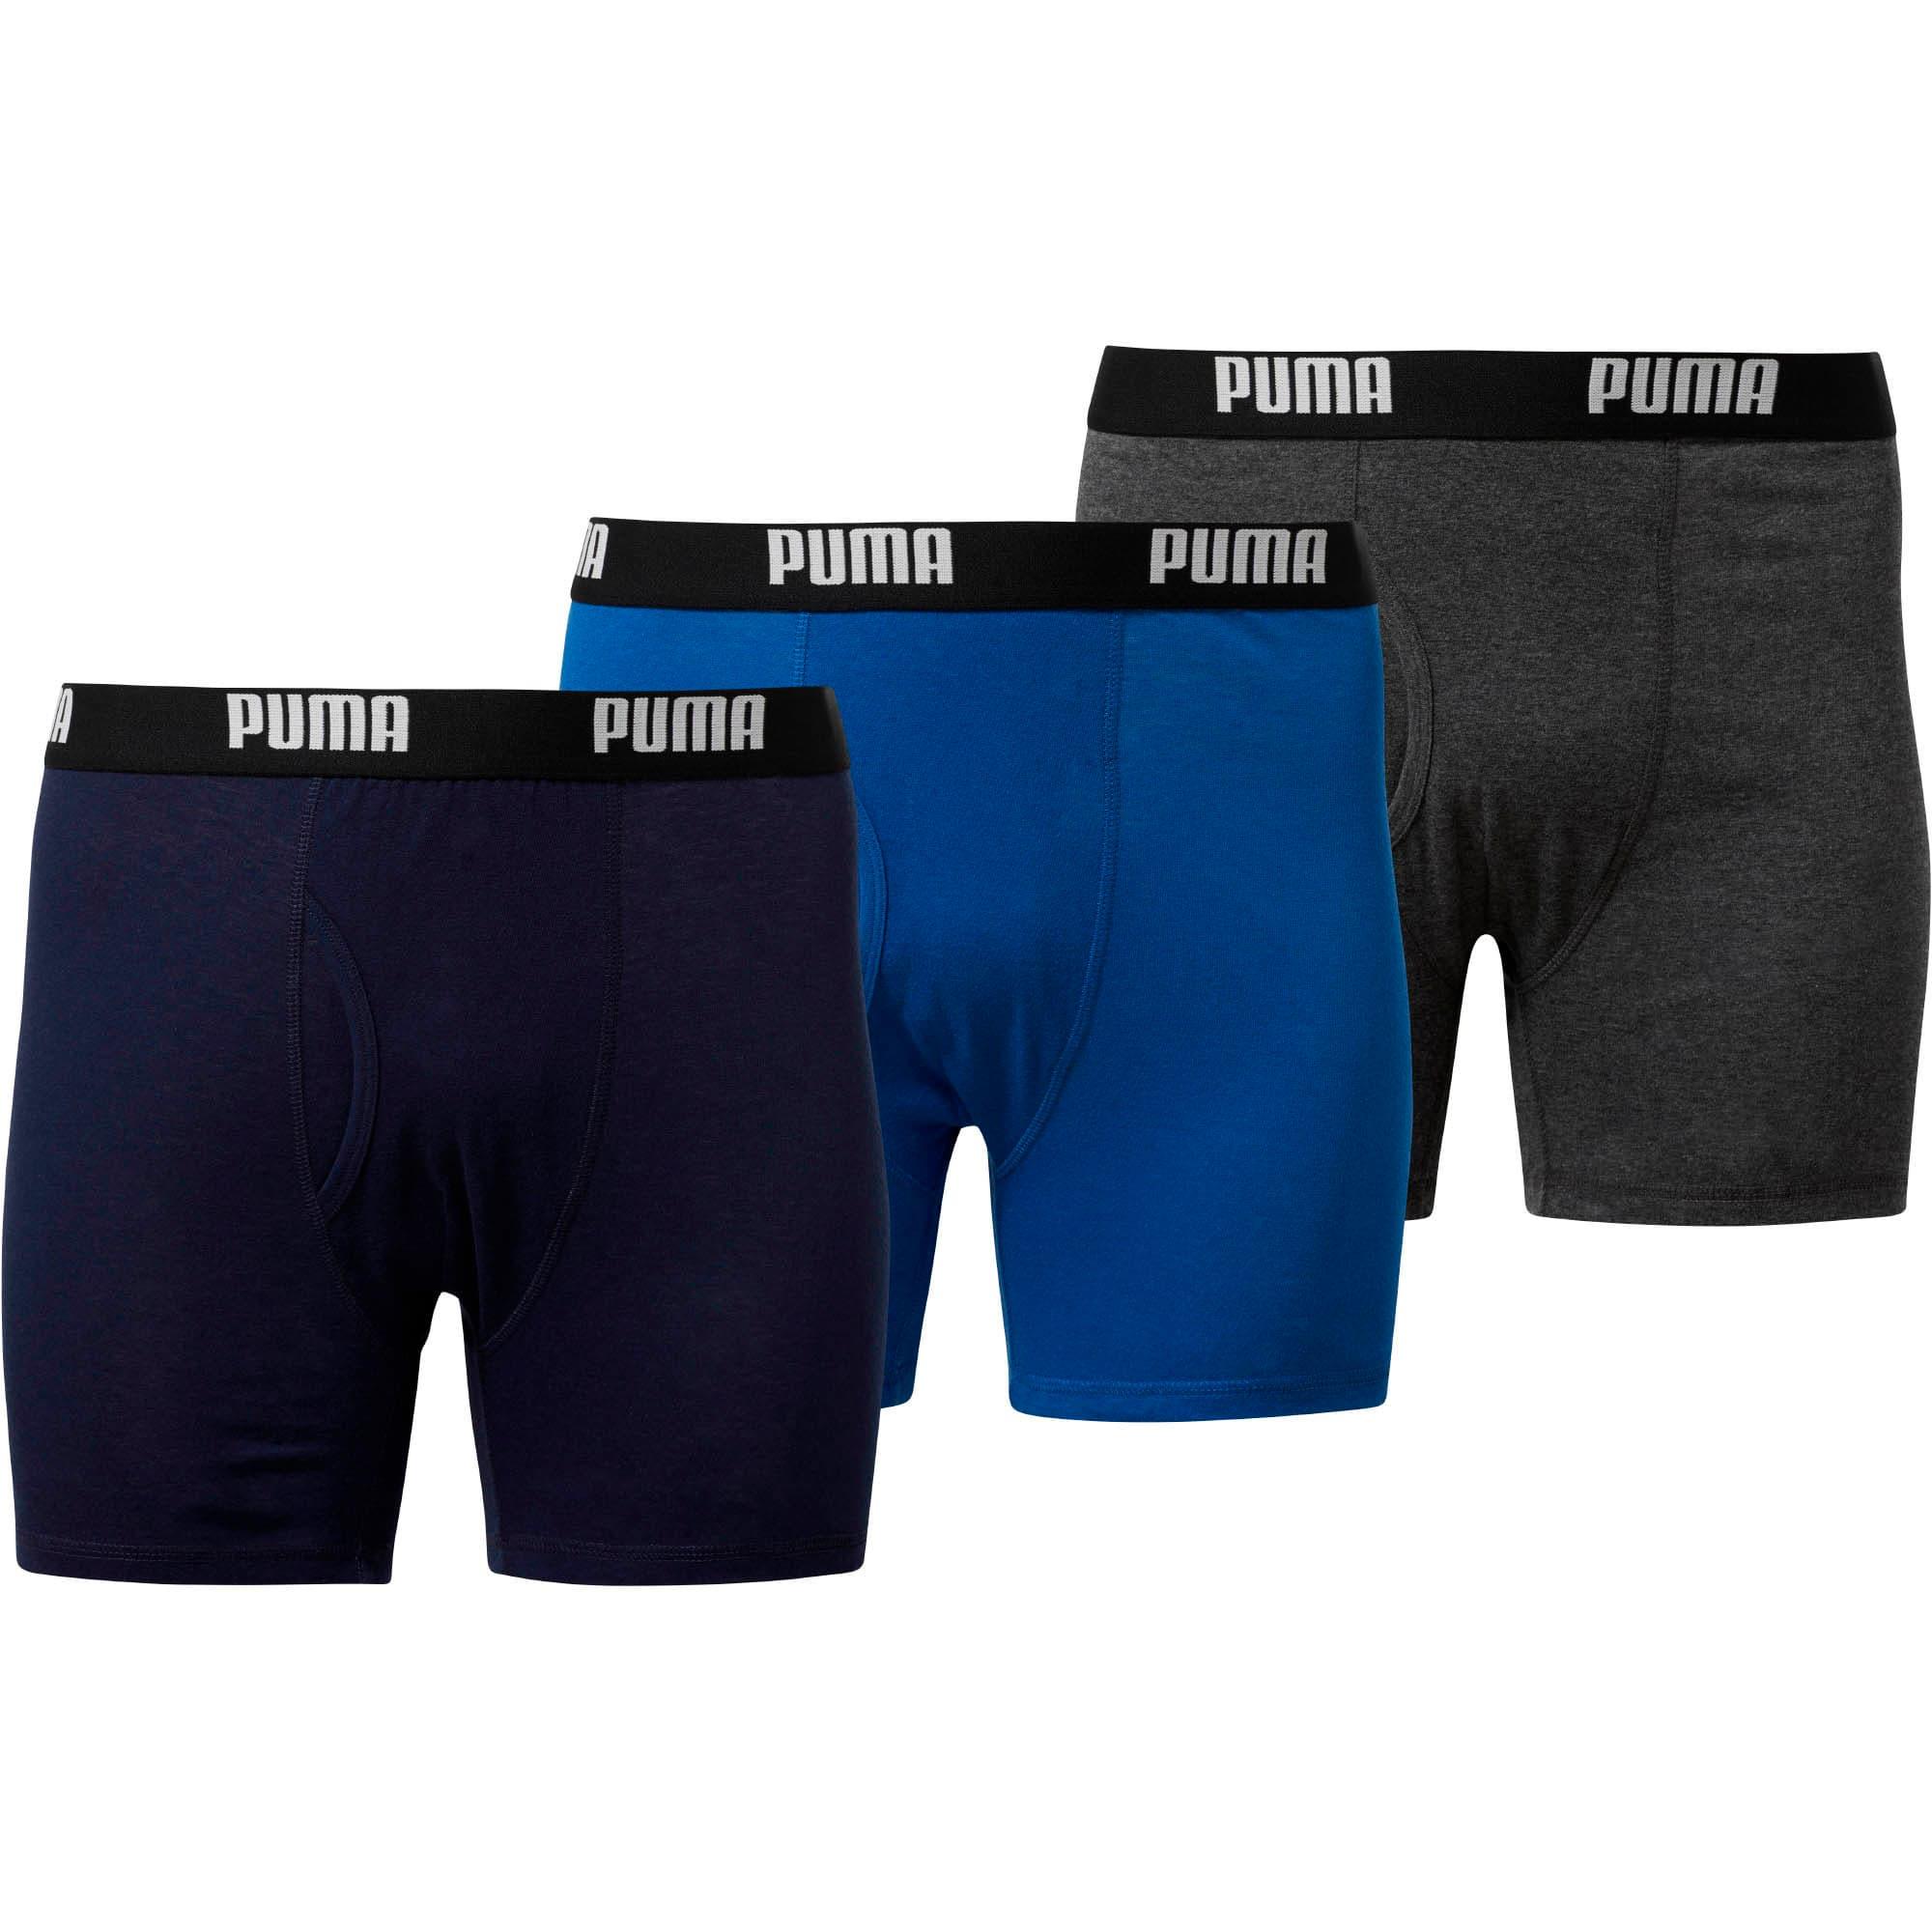 Thumbnail 1 of Men's Cotton Classic Boxer Briefs [3 Pack], BLUE / GREY, medium